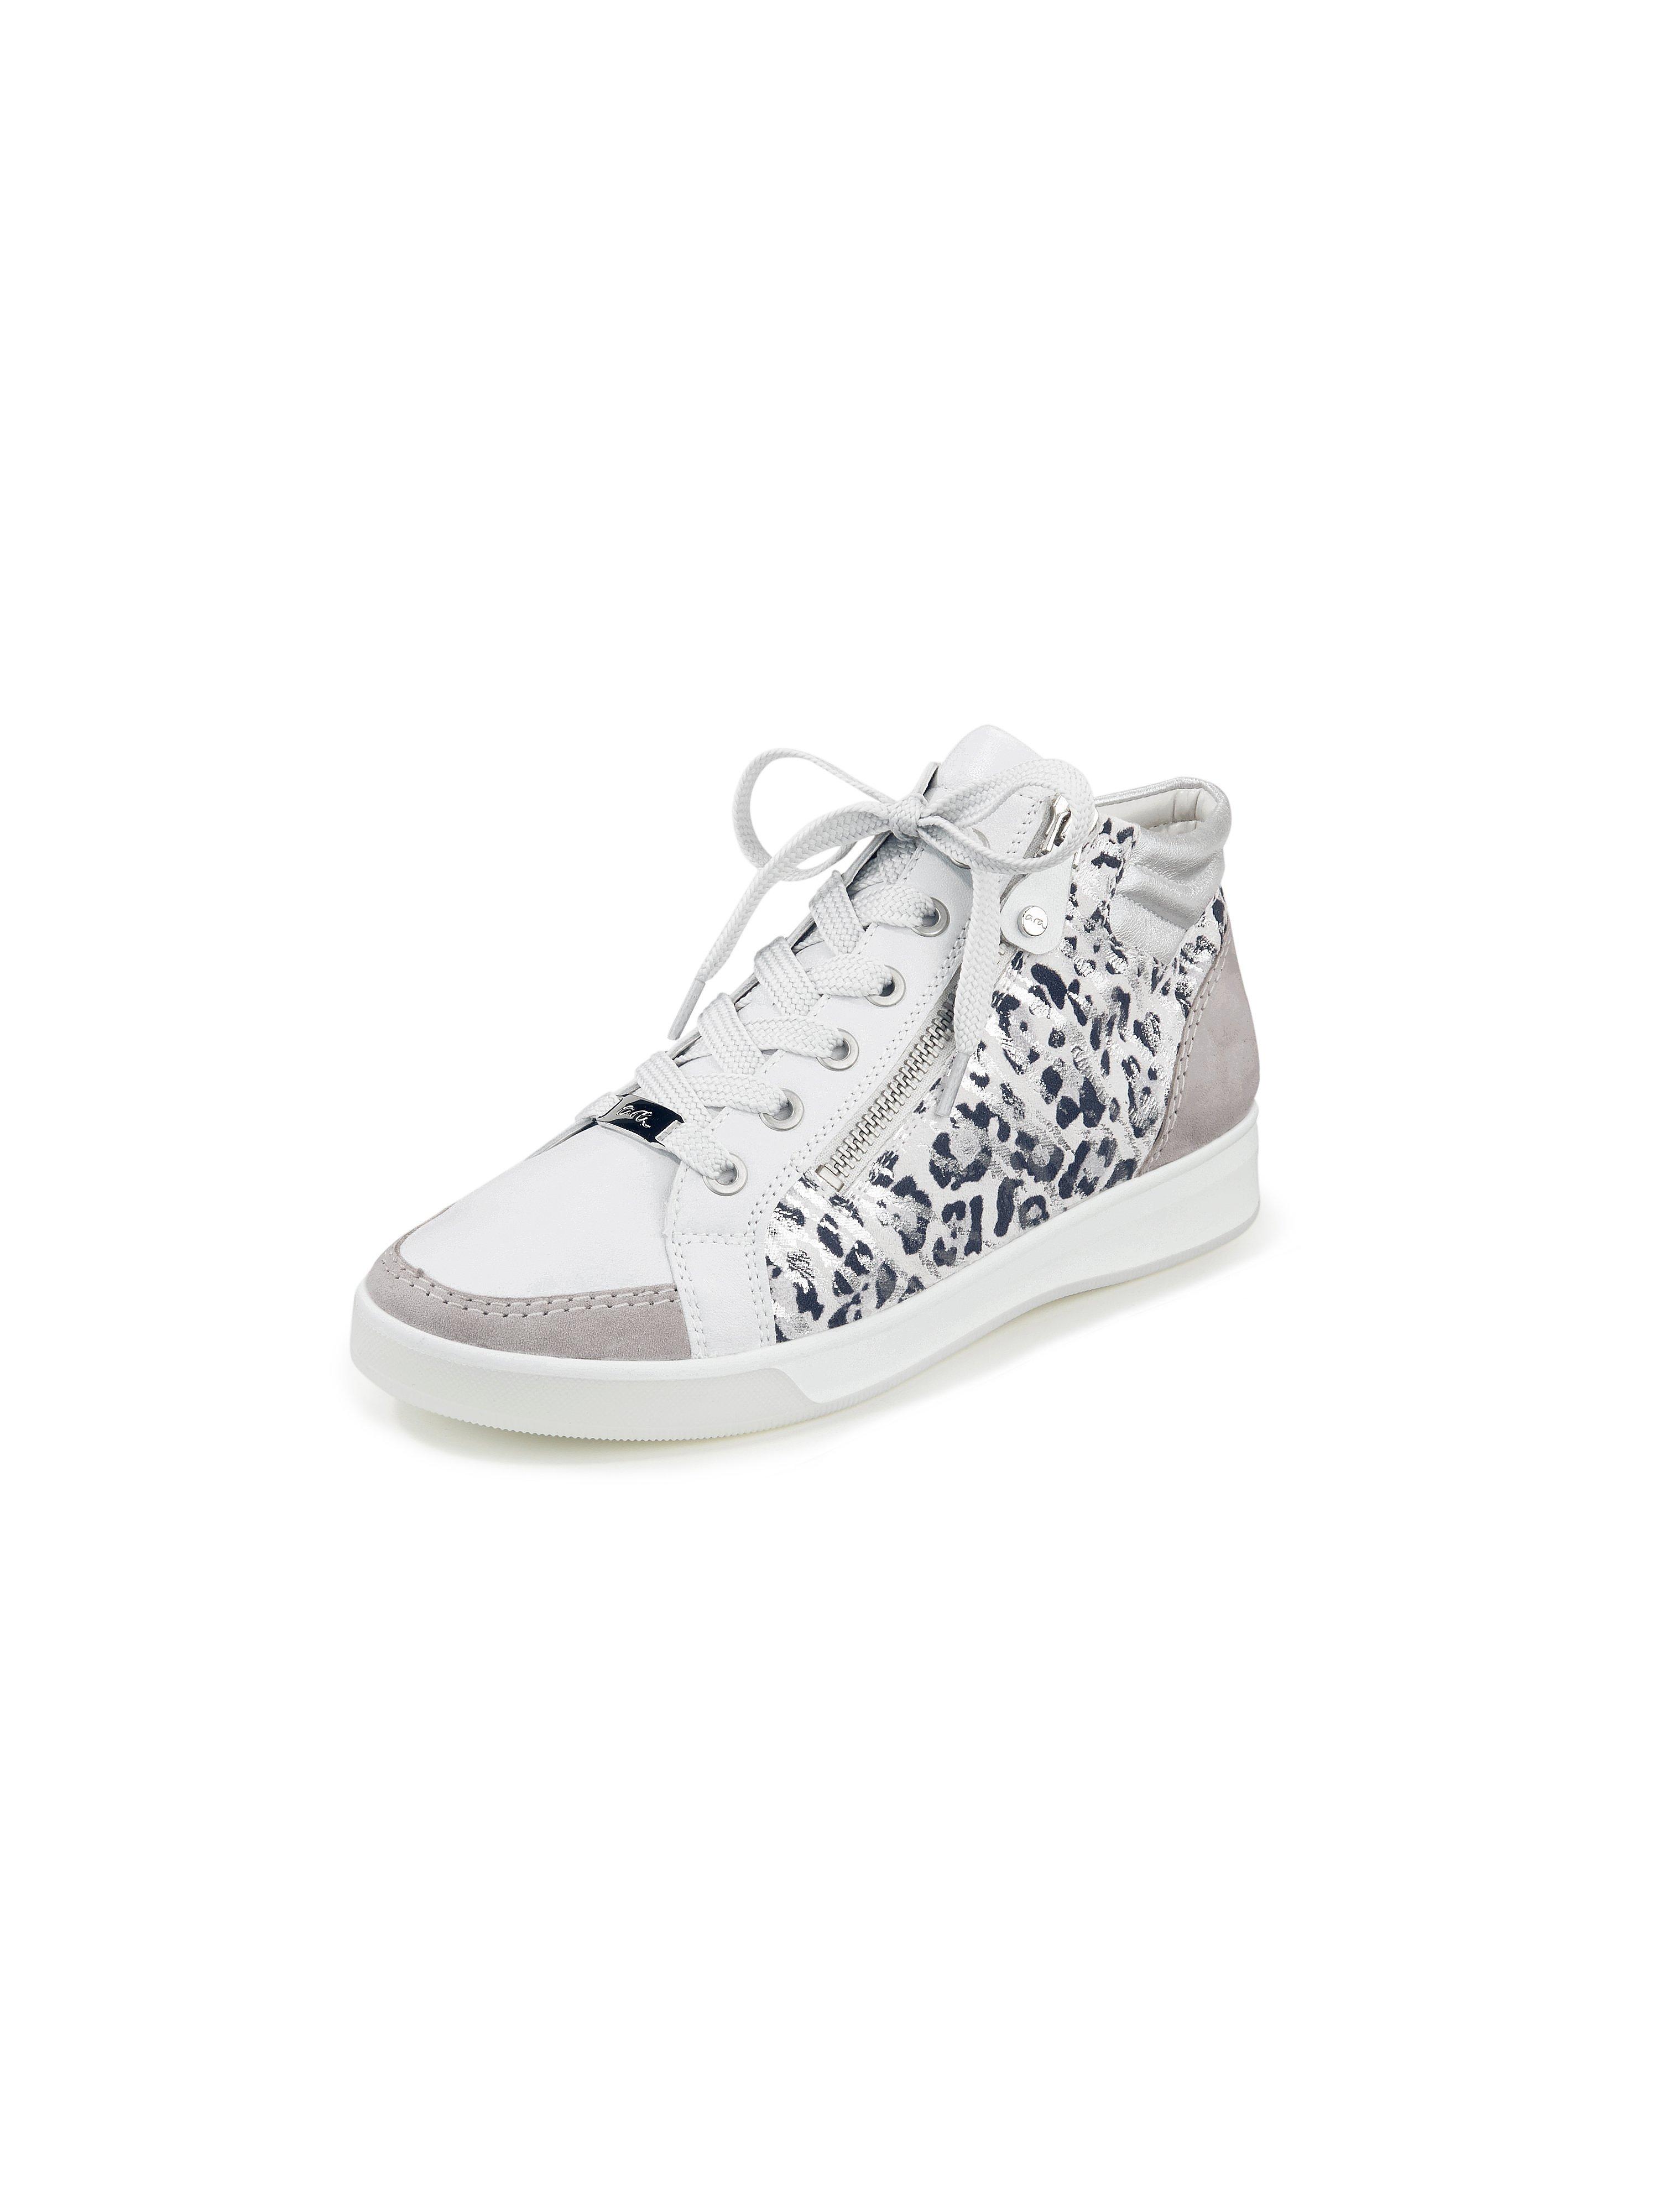 Sneakers van kalfsnappa- en geitensuèdeleer Van ARA beige